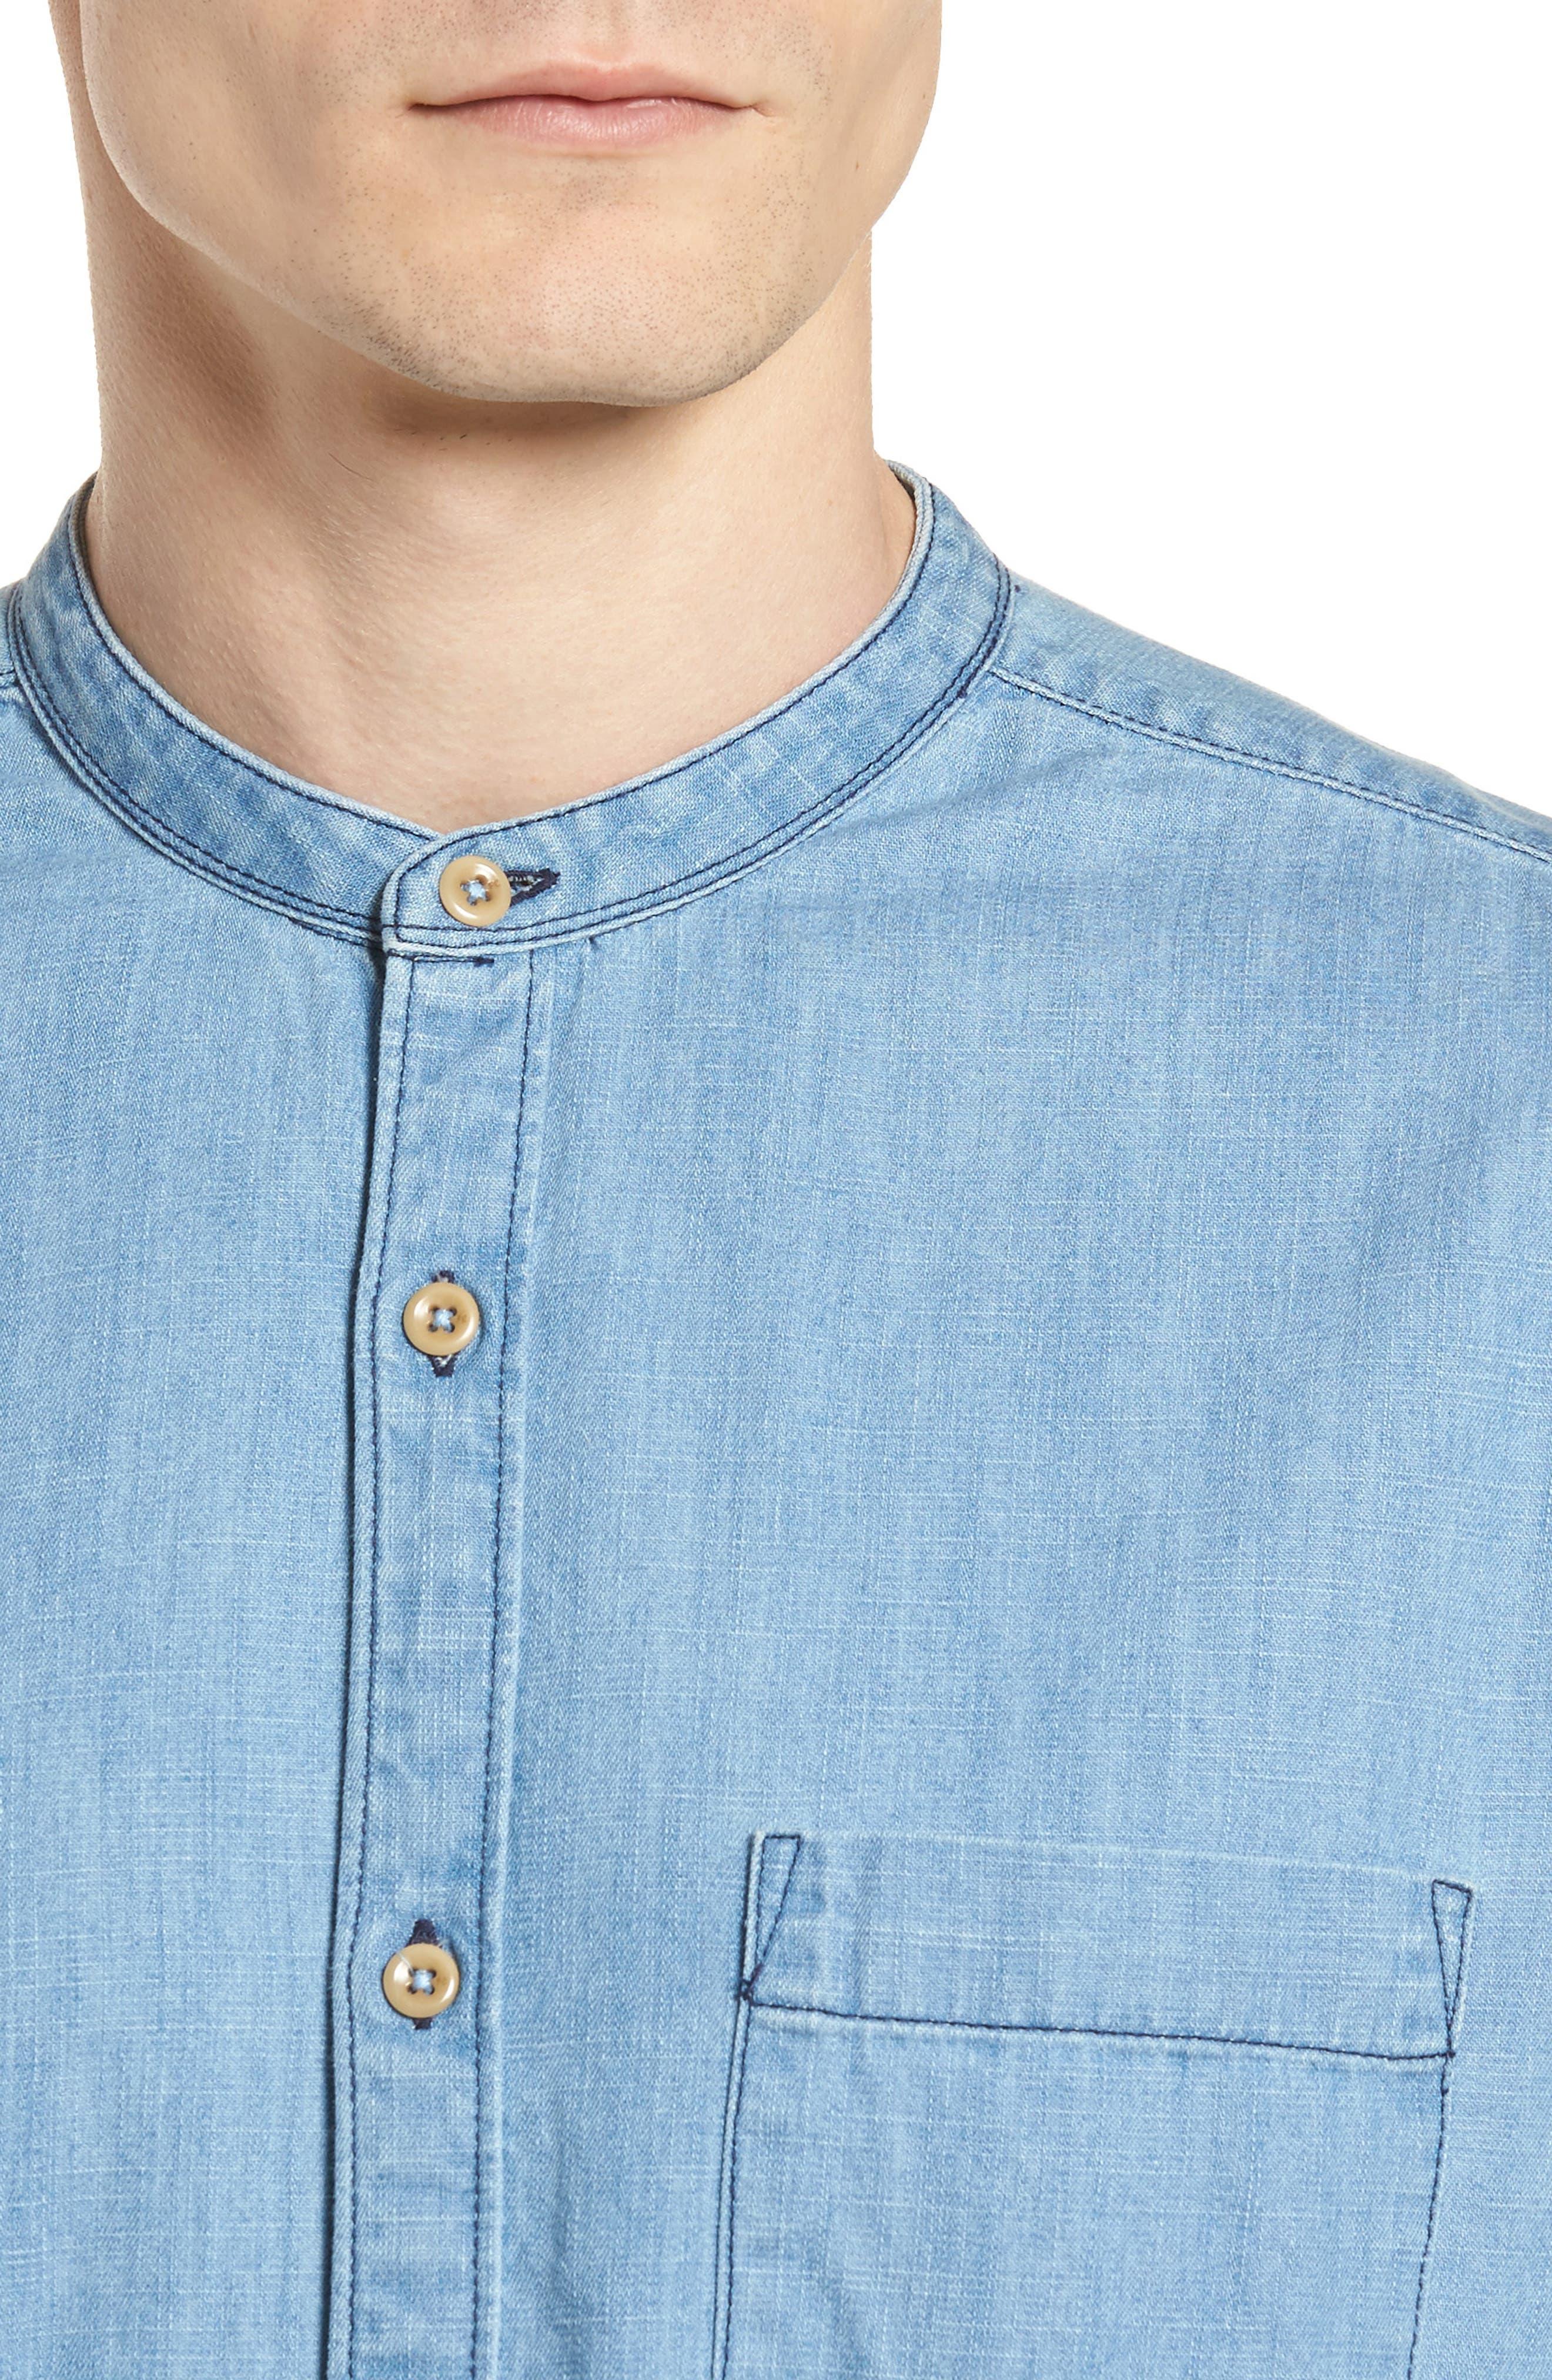 Core Denim Regular Fit Sport Shirt,                             Alternate thumbnail 4, color,                             Bleach